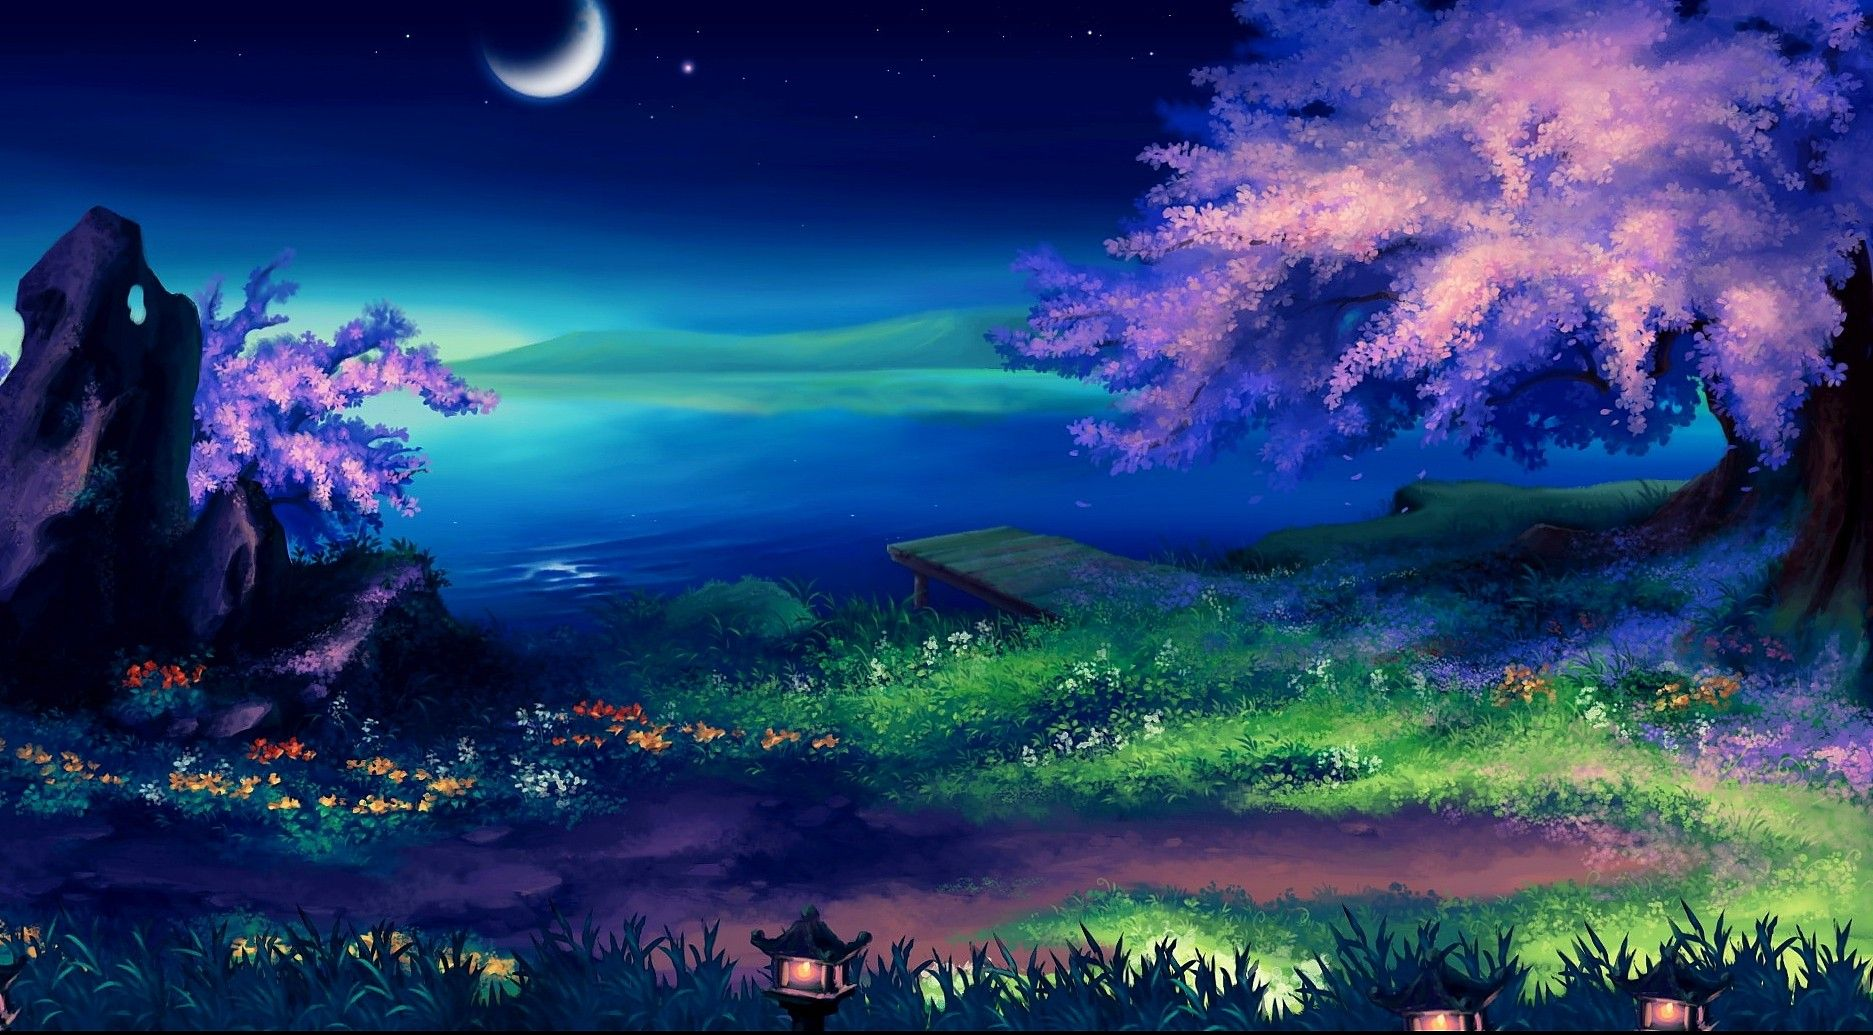 Mostnature Com Moon Amazing Nature Pretty Landscape Splendor Magic Fantasy Beautiful Colorful Night Rice Fantasy Landscape Pretty Landscapes Fantasy Pictures